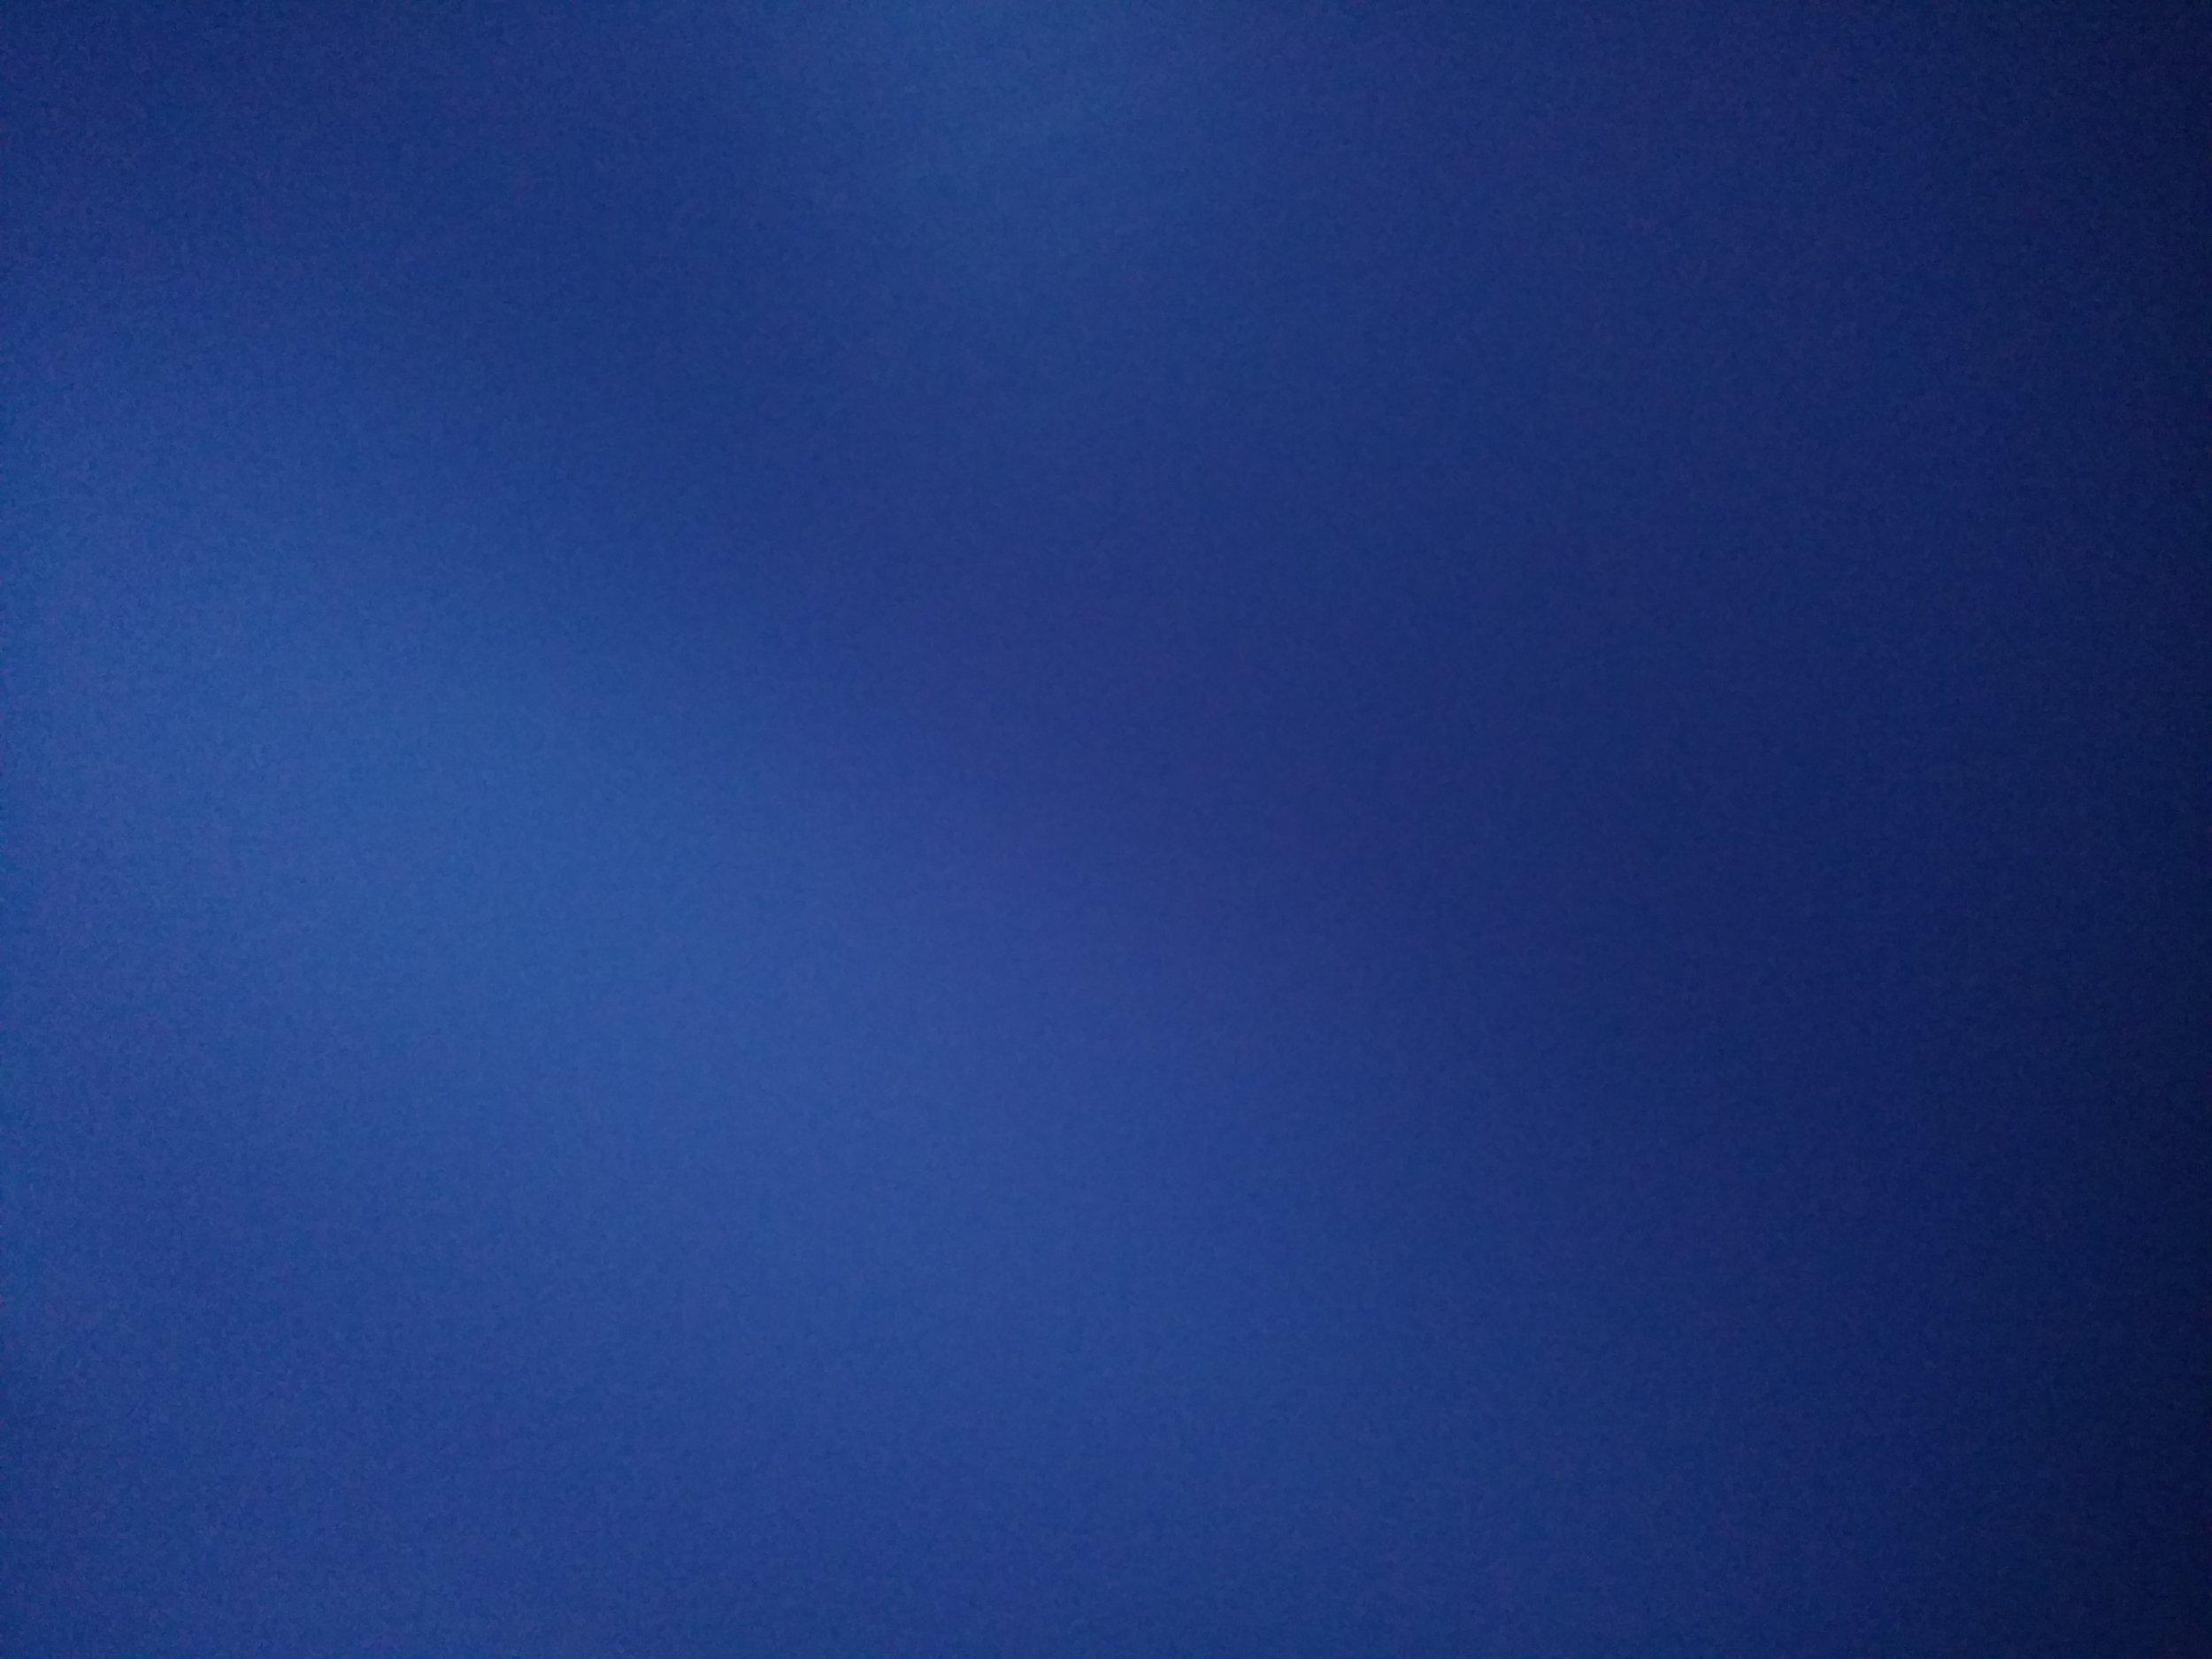 willroth-co-free-texture-gradient-010.jpg